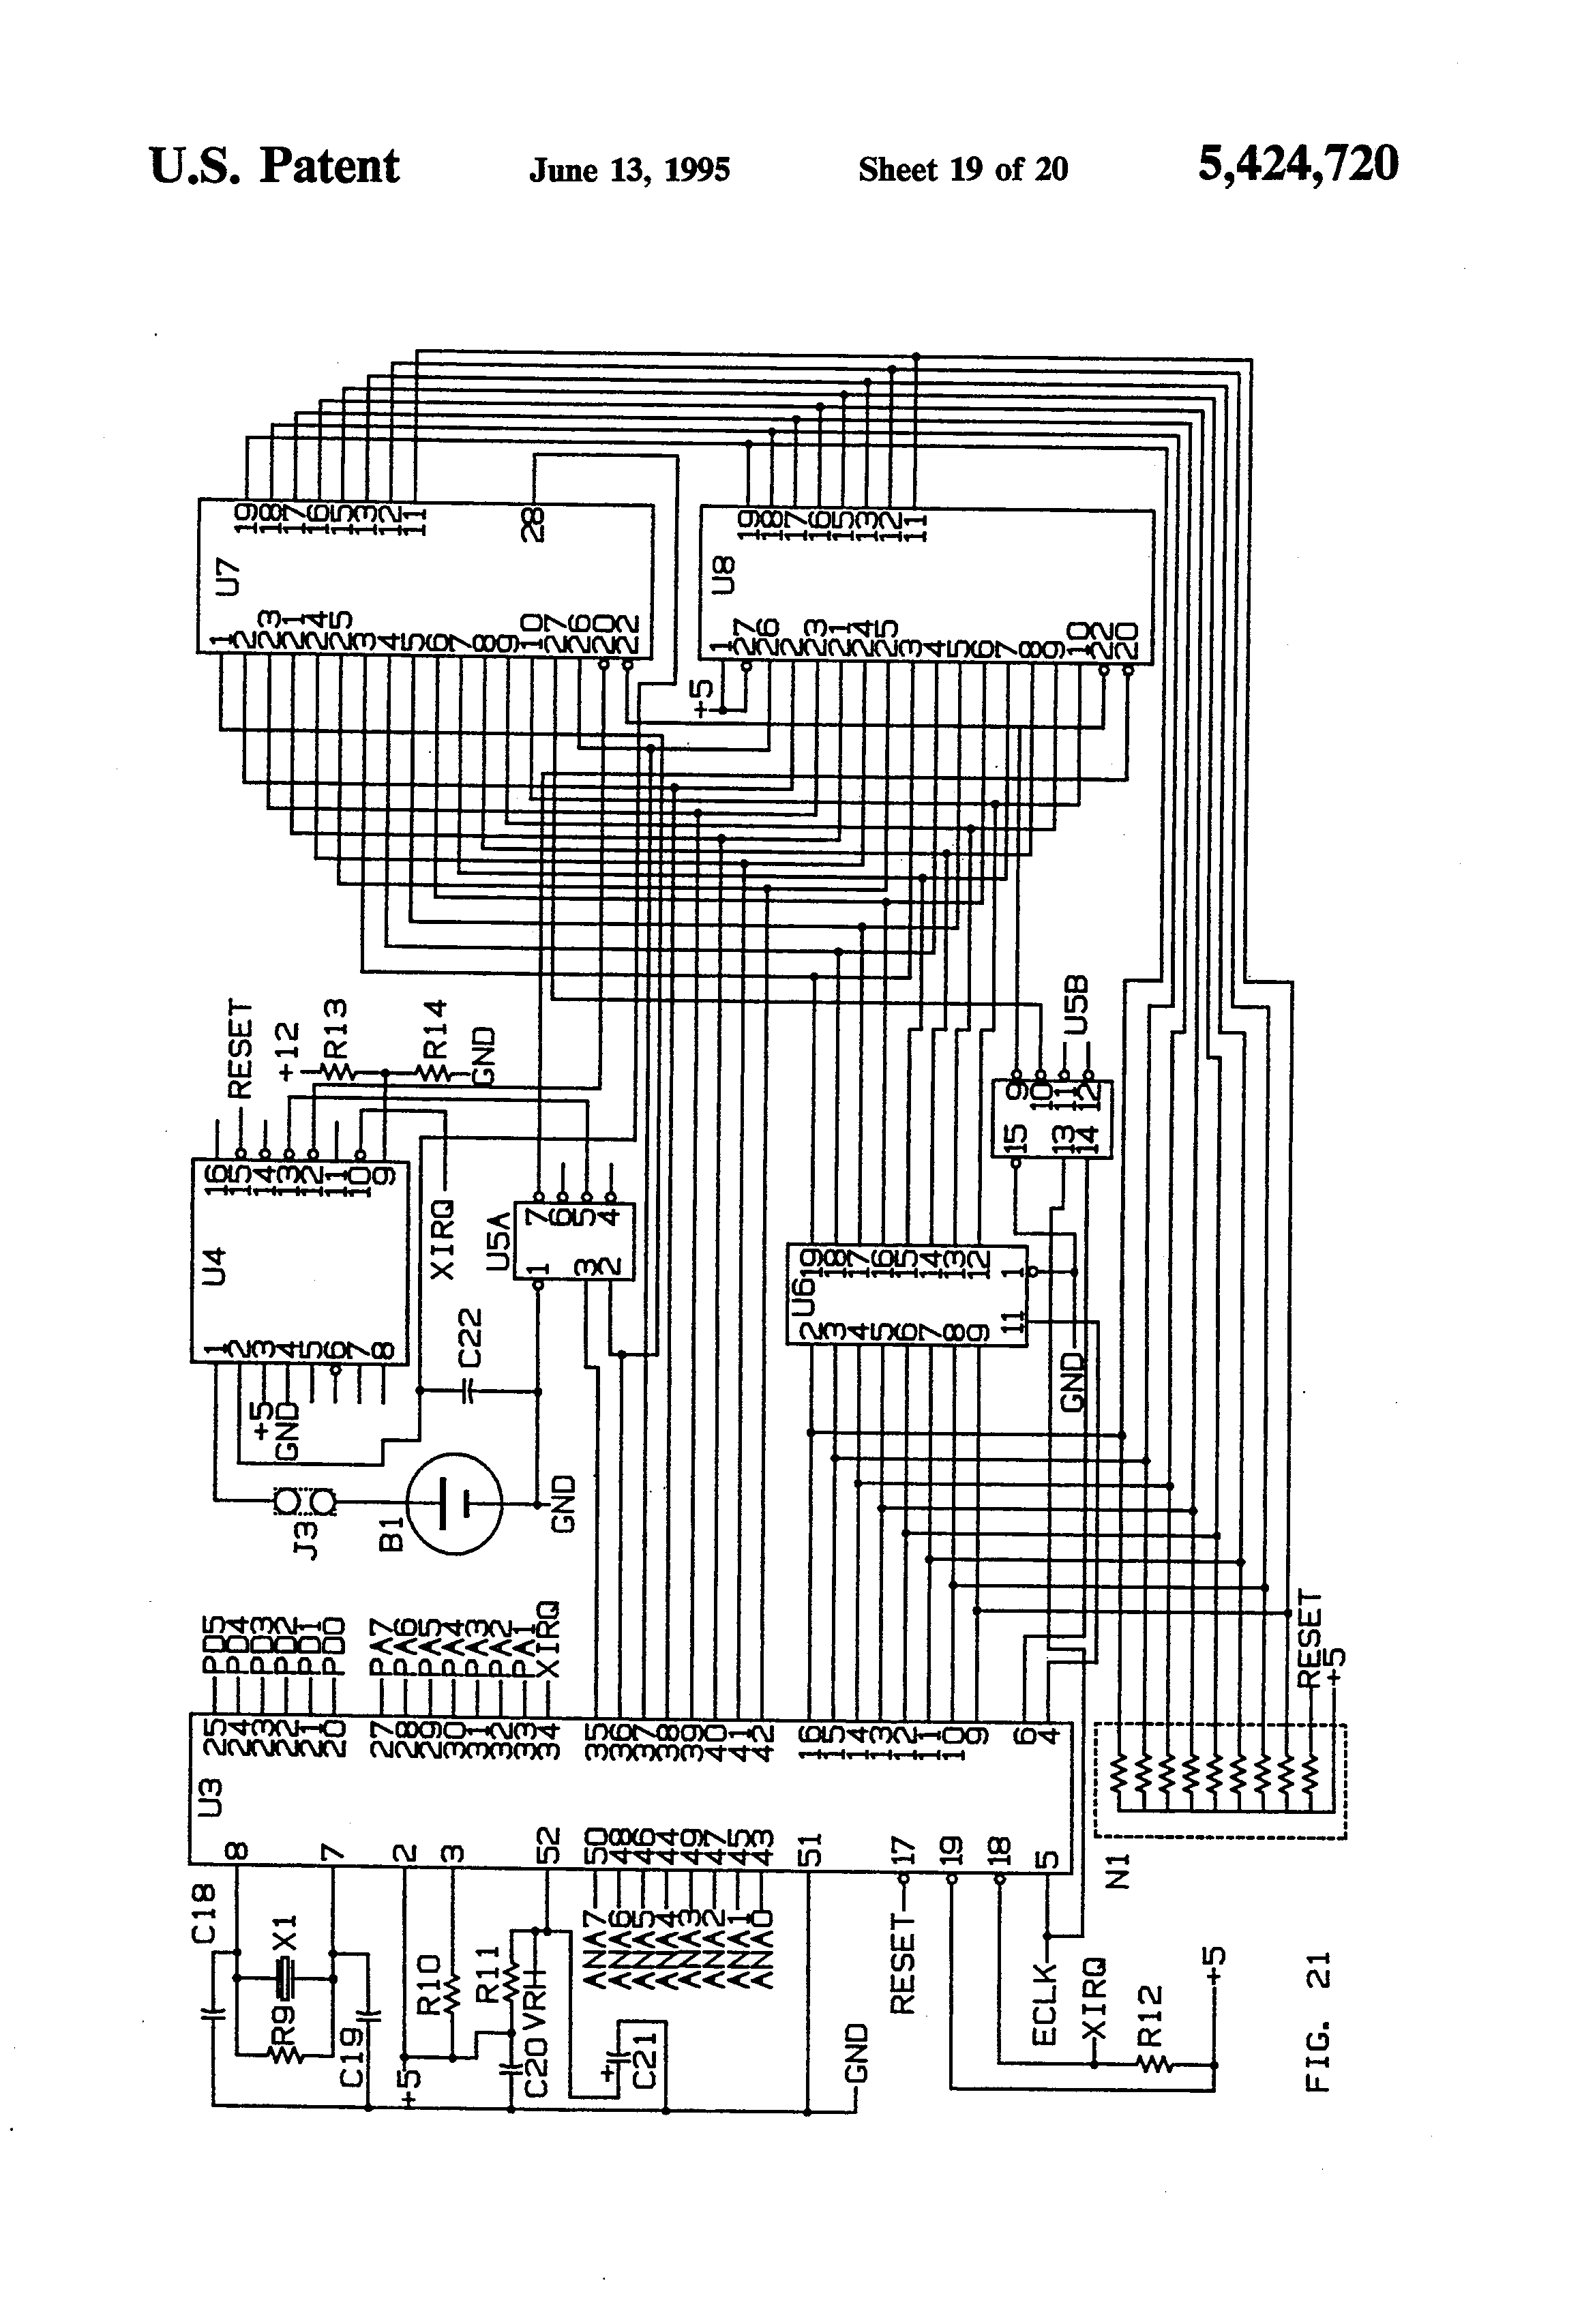 Ny 7163 Vt700 Wiring Diagram Schematic Wiring